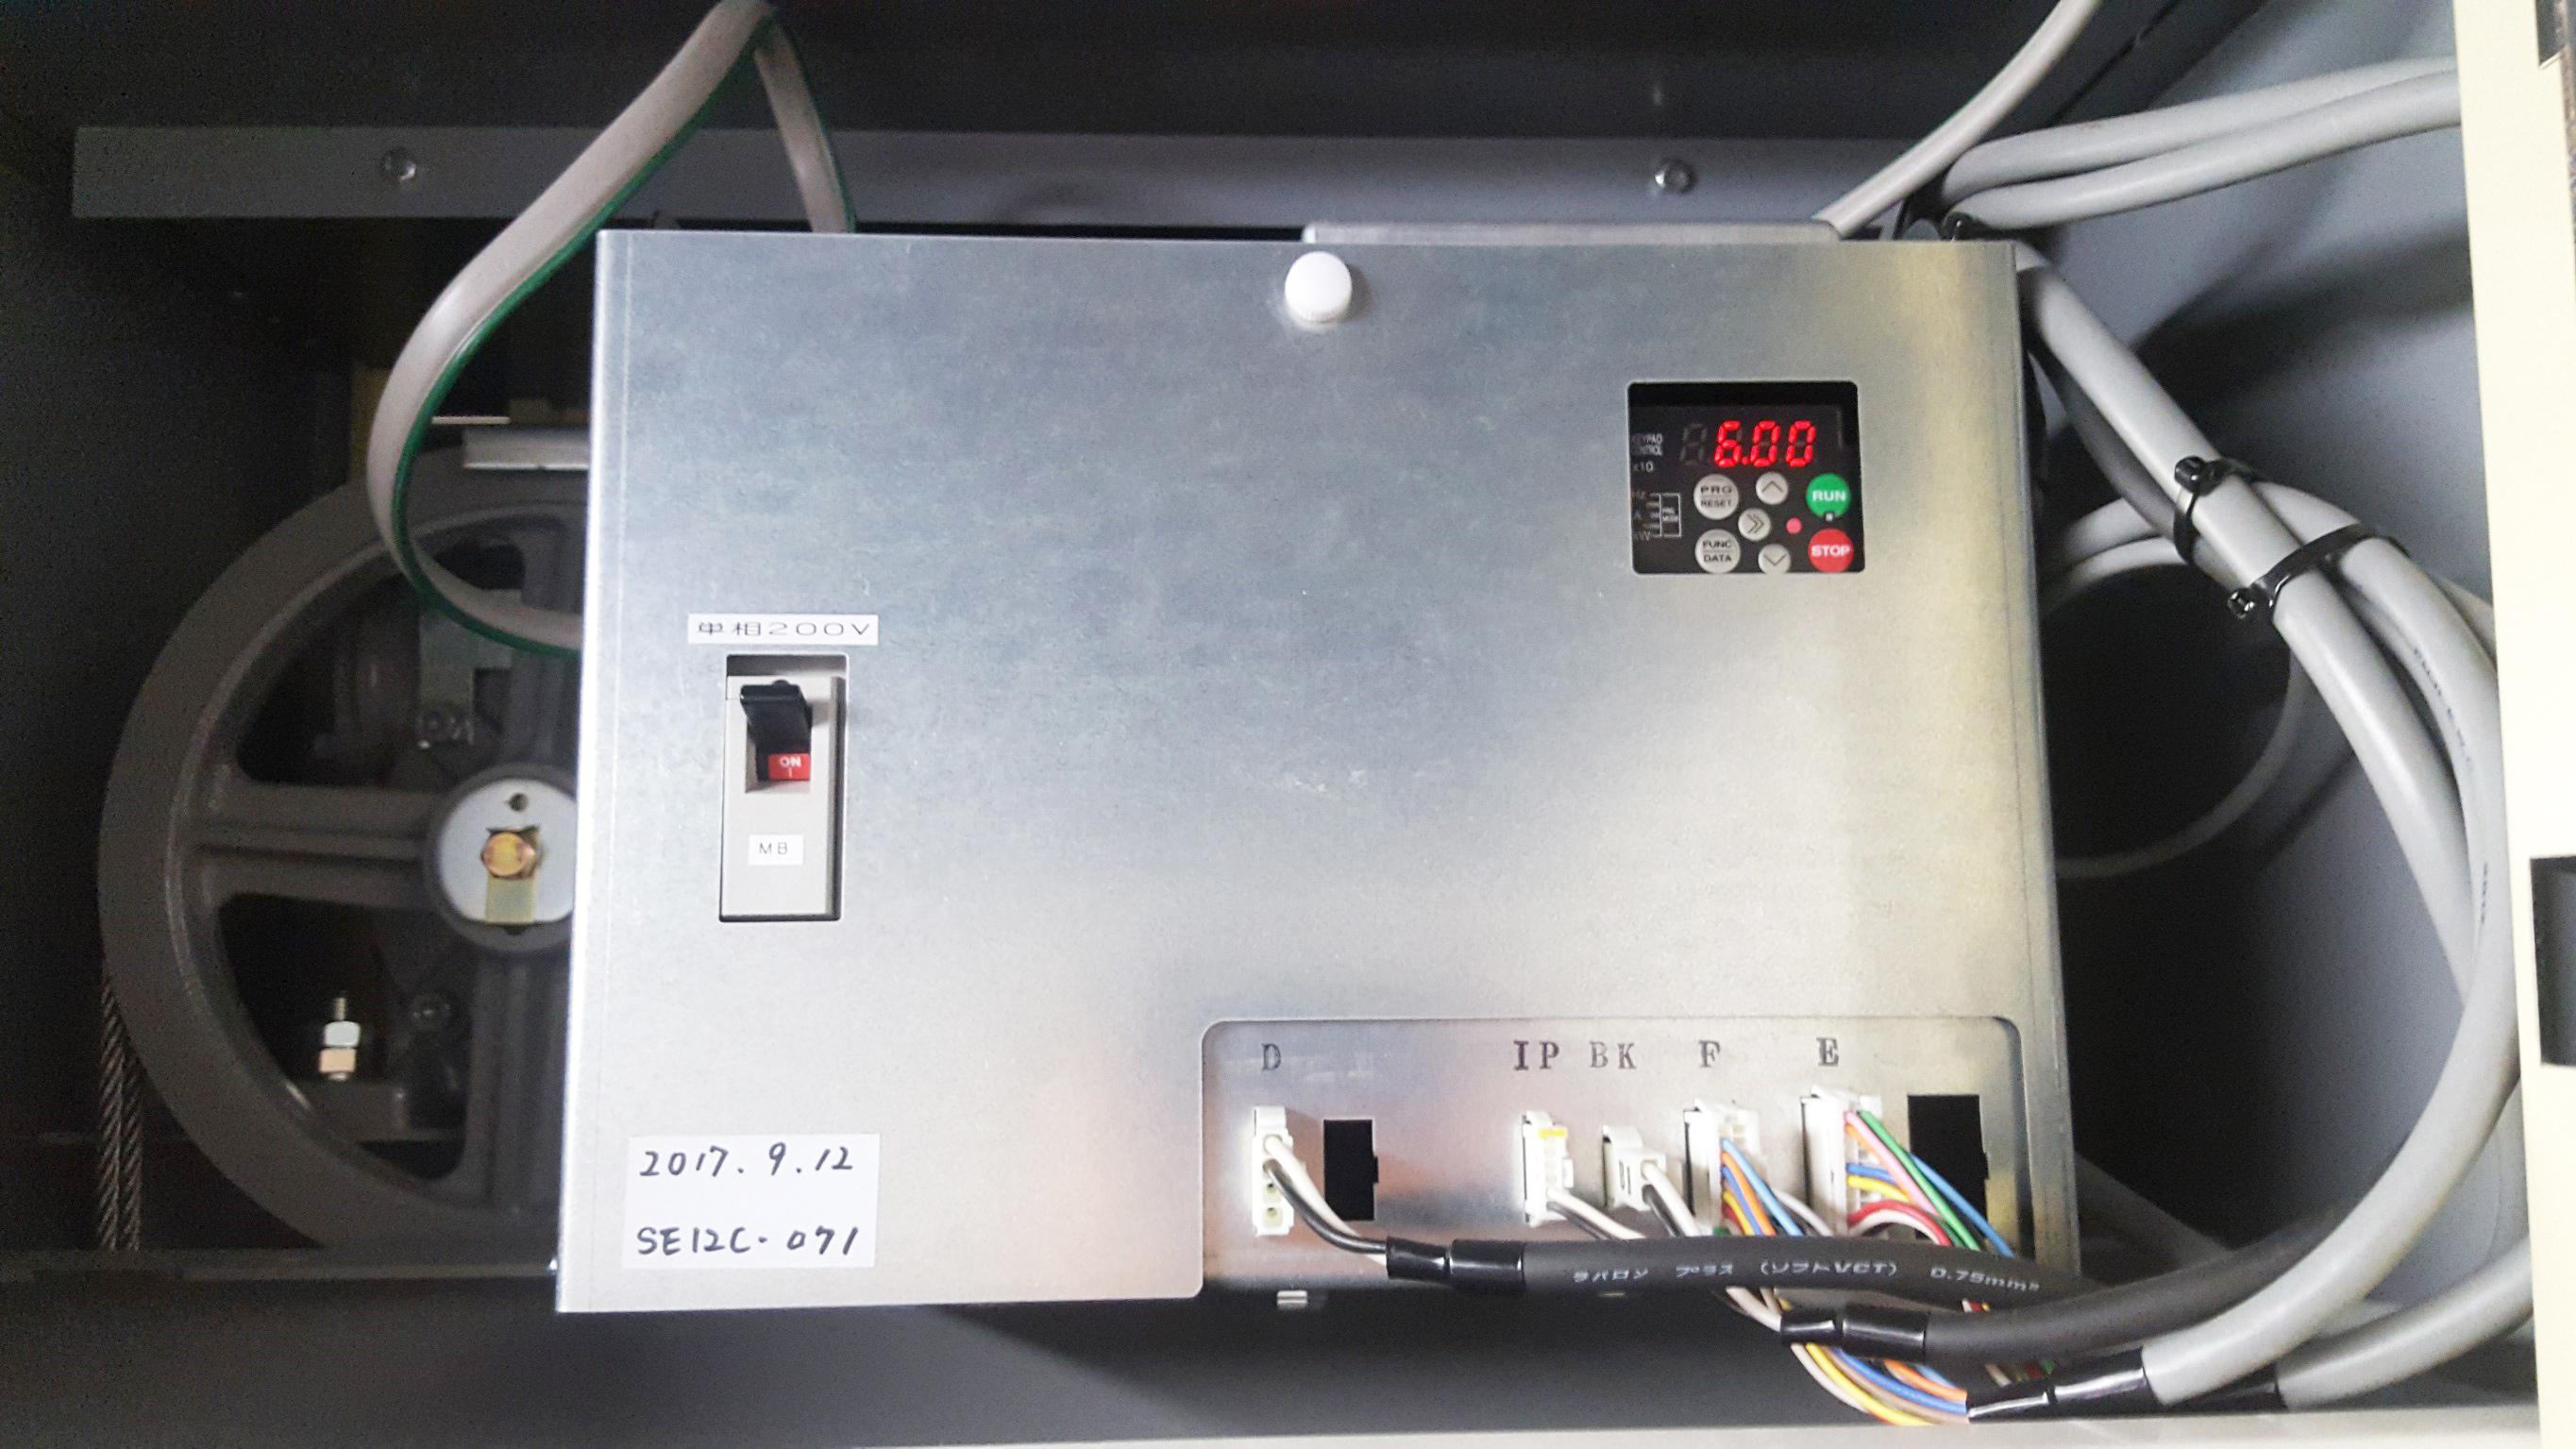 小荷物専用昇降機の制御盤